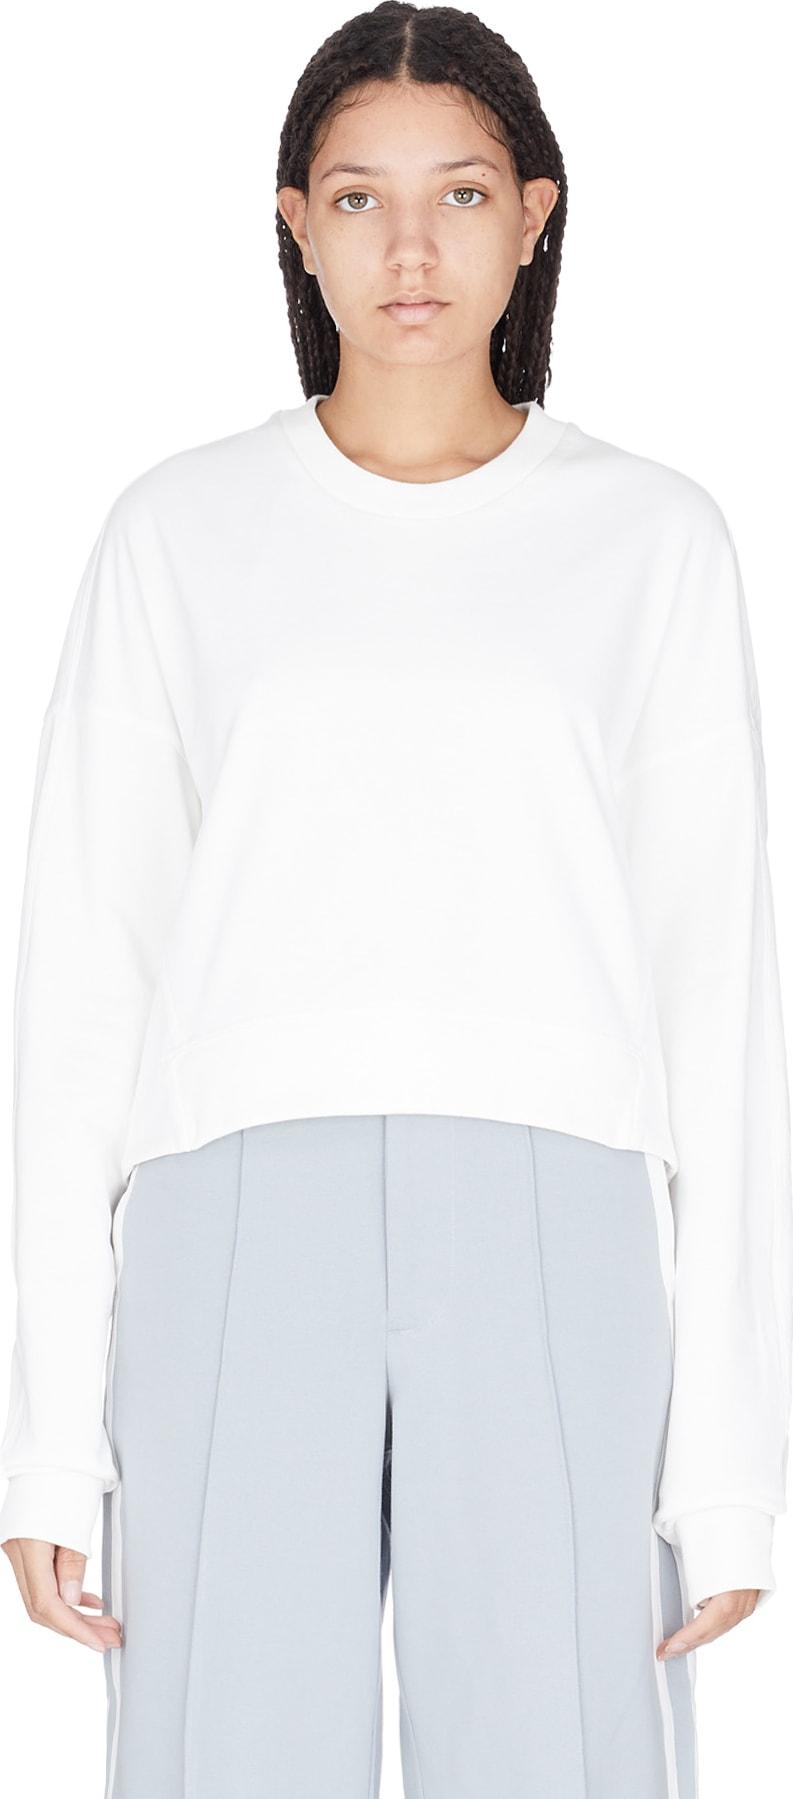 4ee2825d1b1 Y-3: Yohji Love Pullover - Core White | influenceu